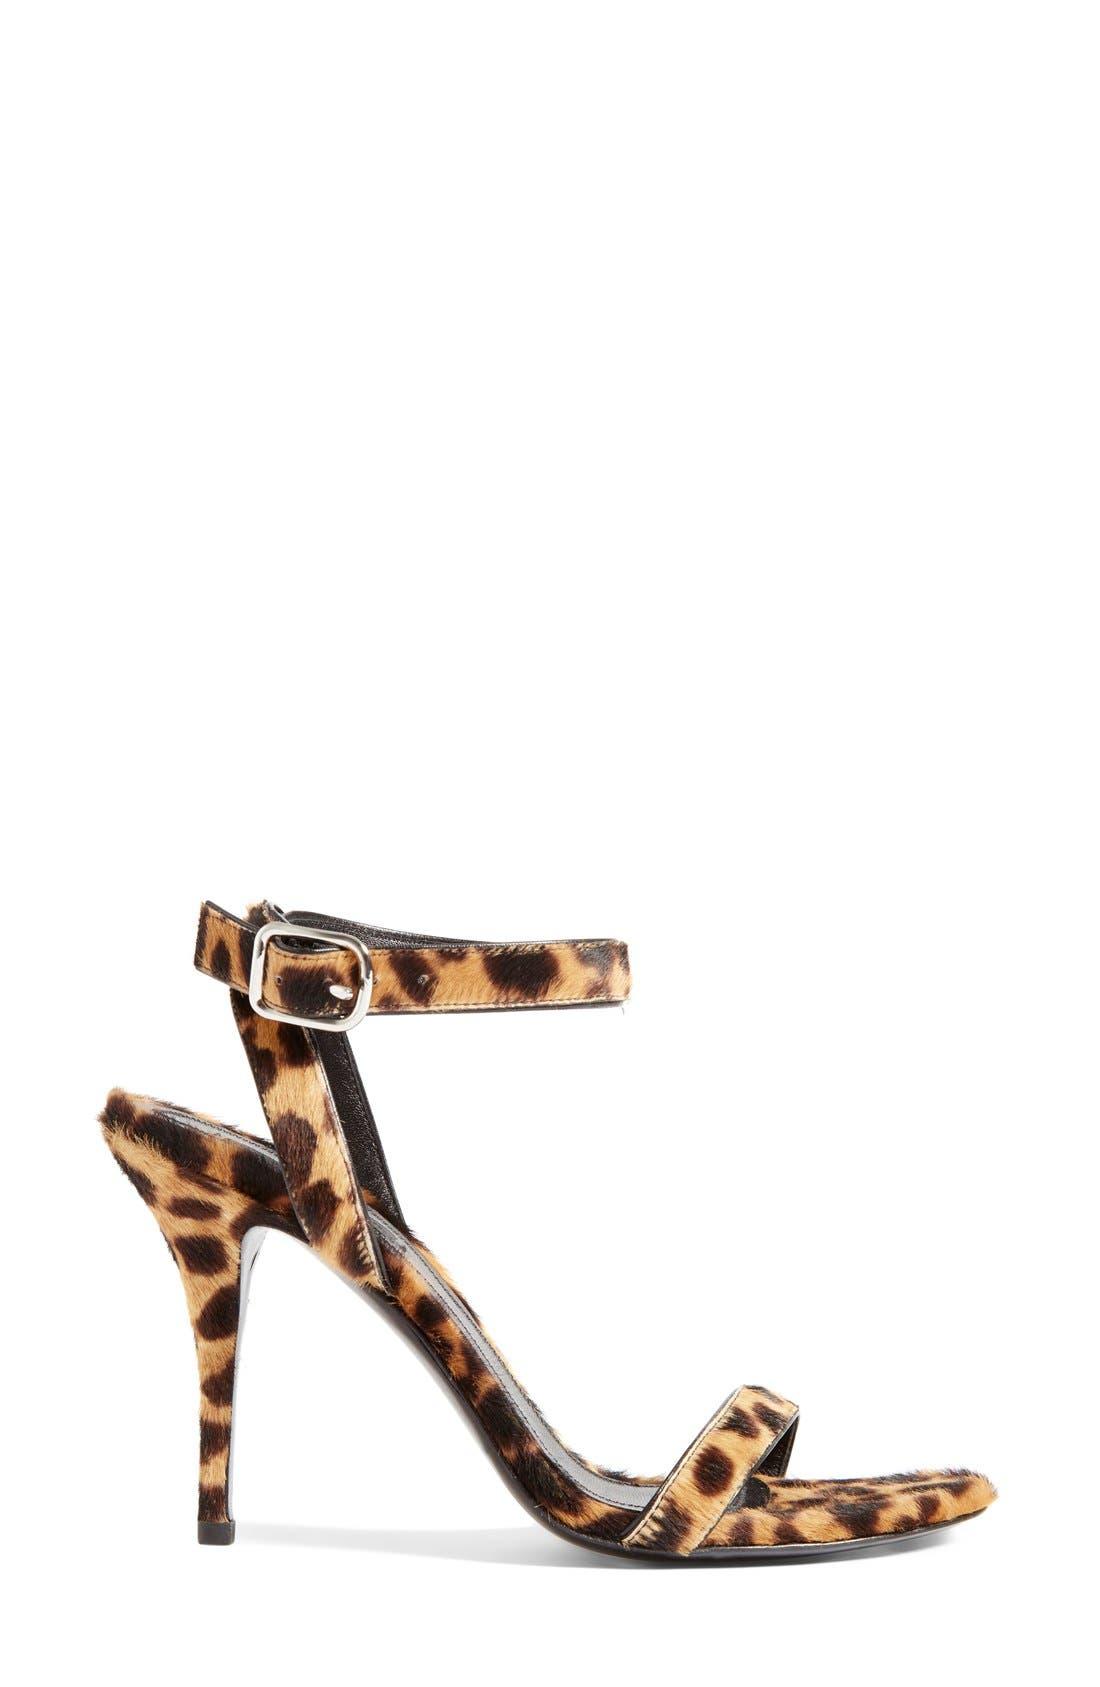 ALEXANDER WANG, 'Atalya' Genuine Calf Hair Ankle Strap Sandal, Alternate thumbnail 3, color, 250